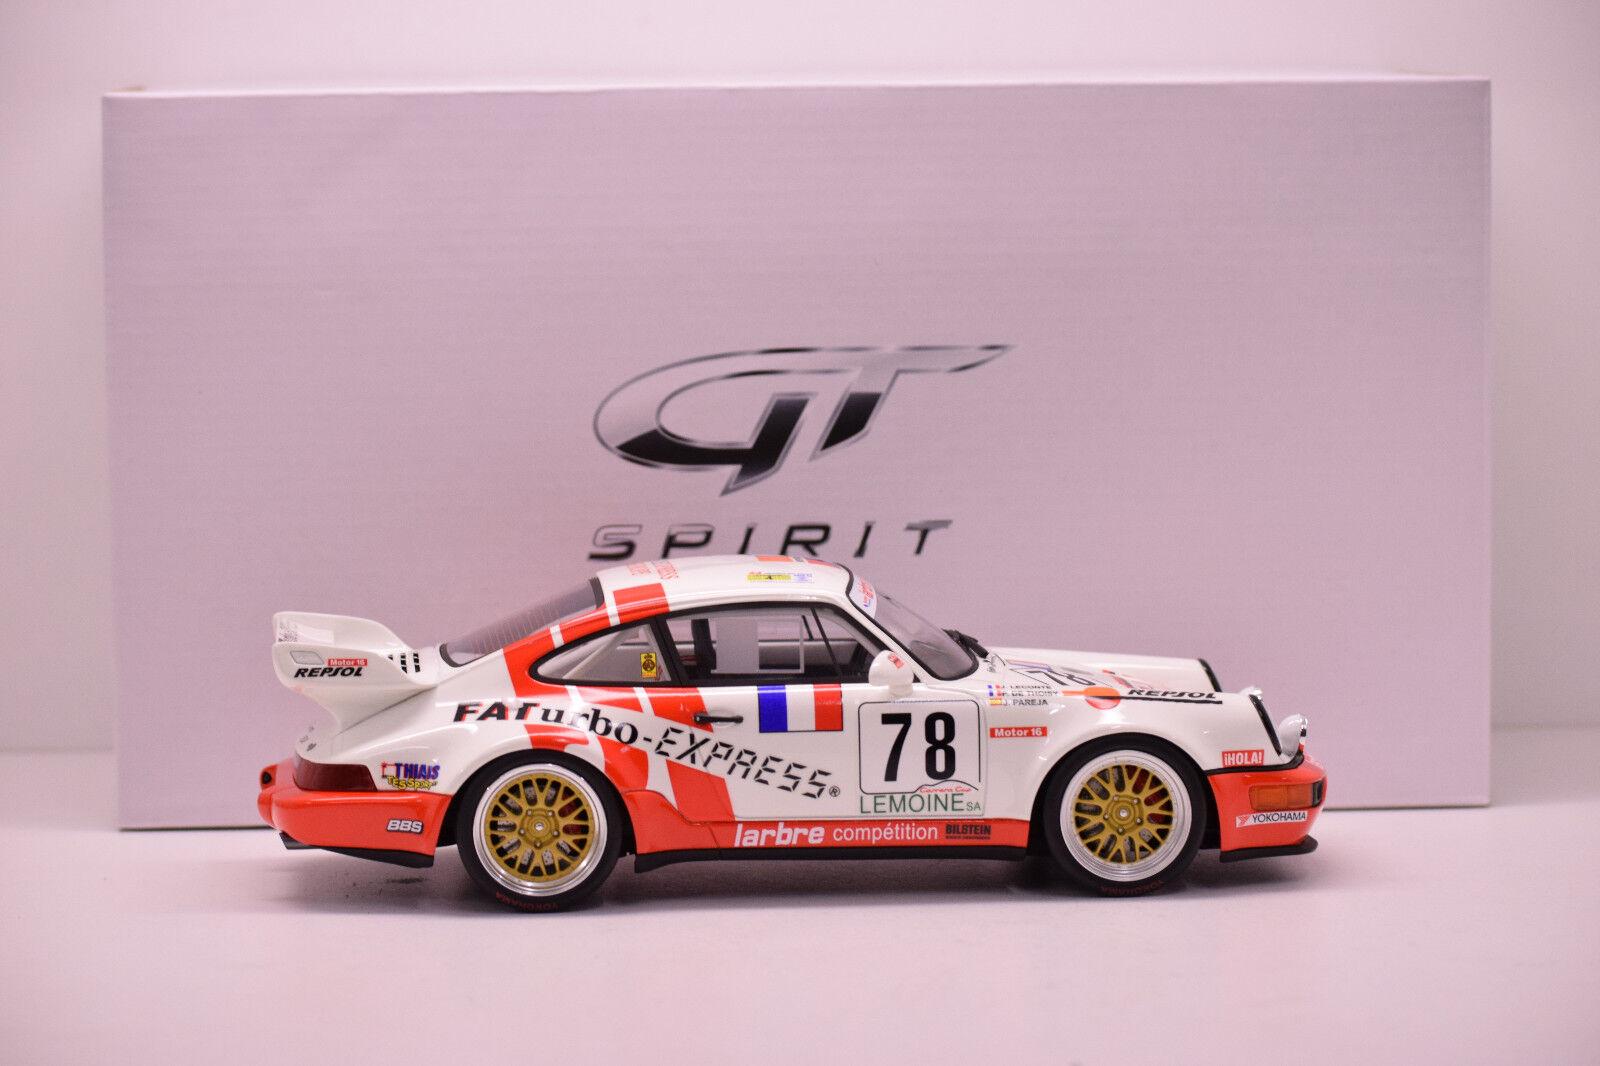 PORSCHE 964 RSR LE MANS 1993 GT SPIRIT 1 18 NEUVE EN BOITE N° 241 504